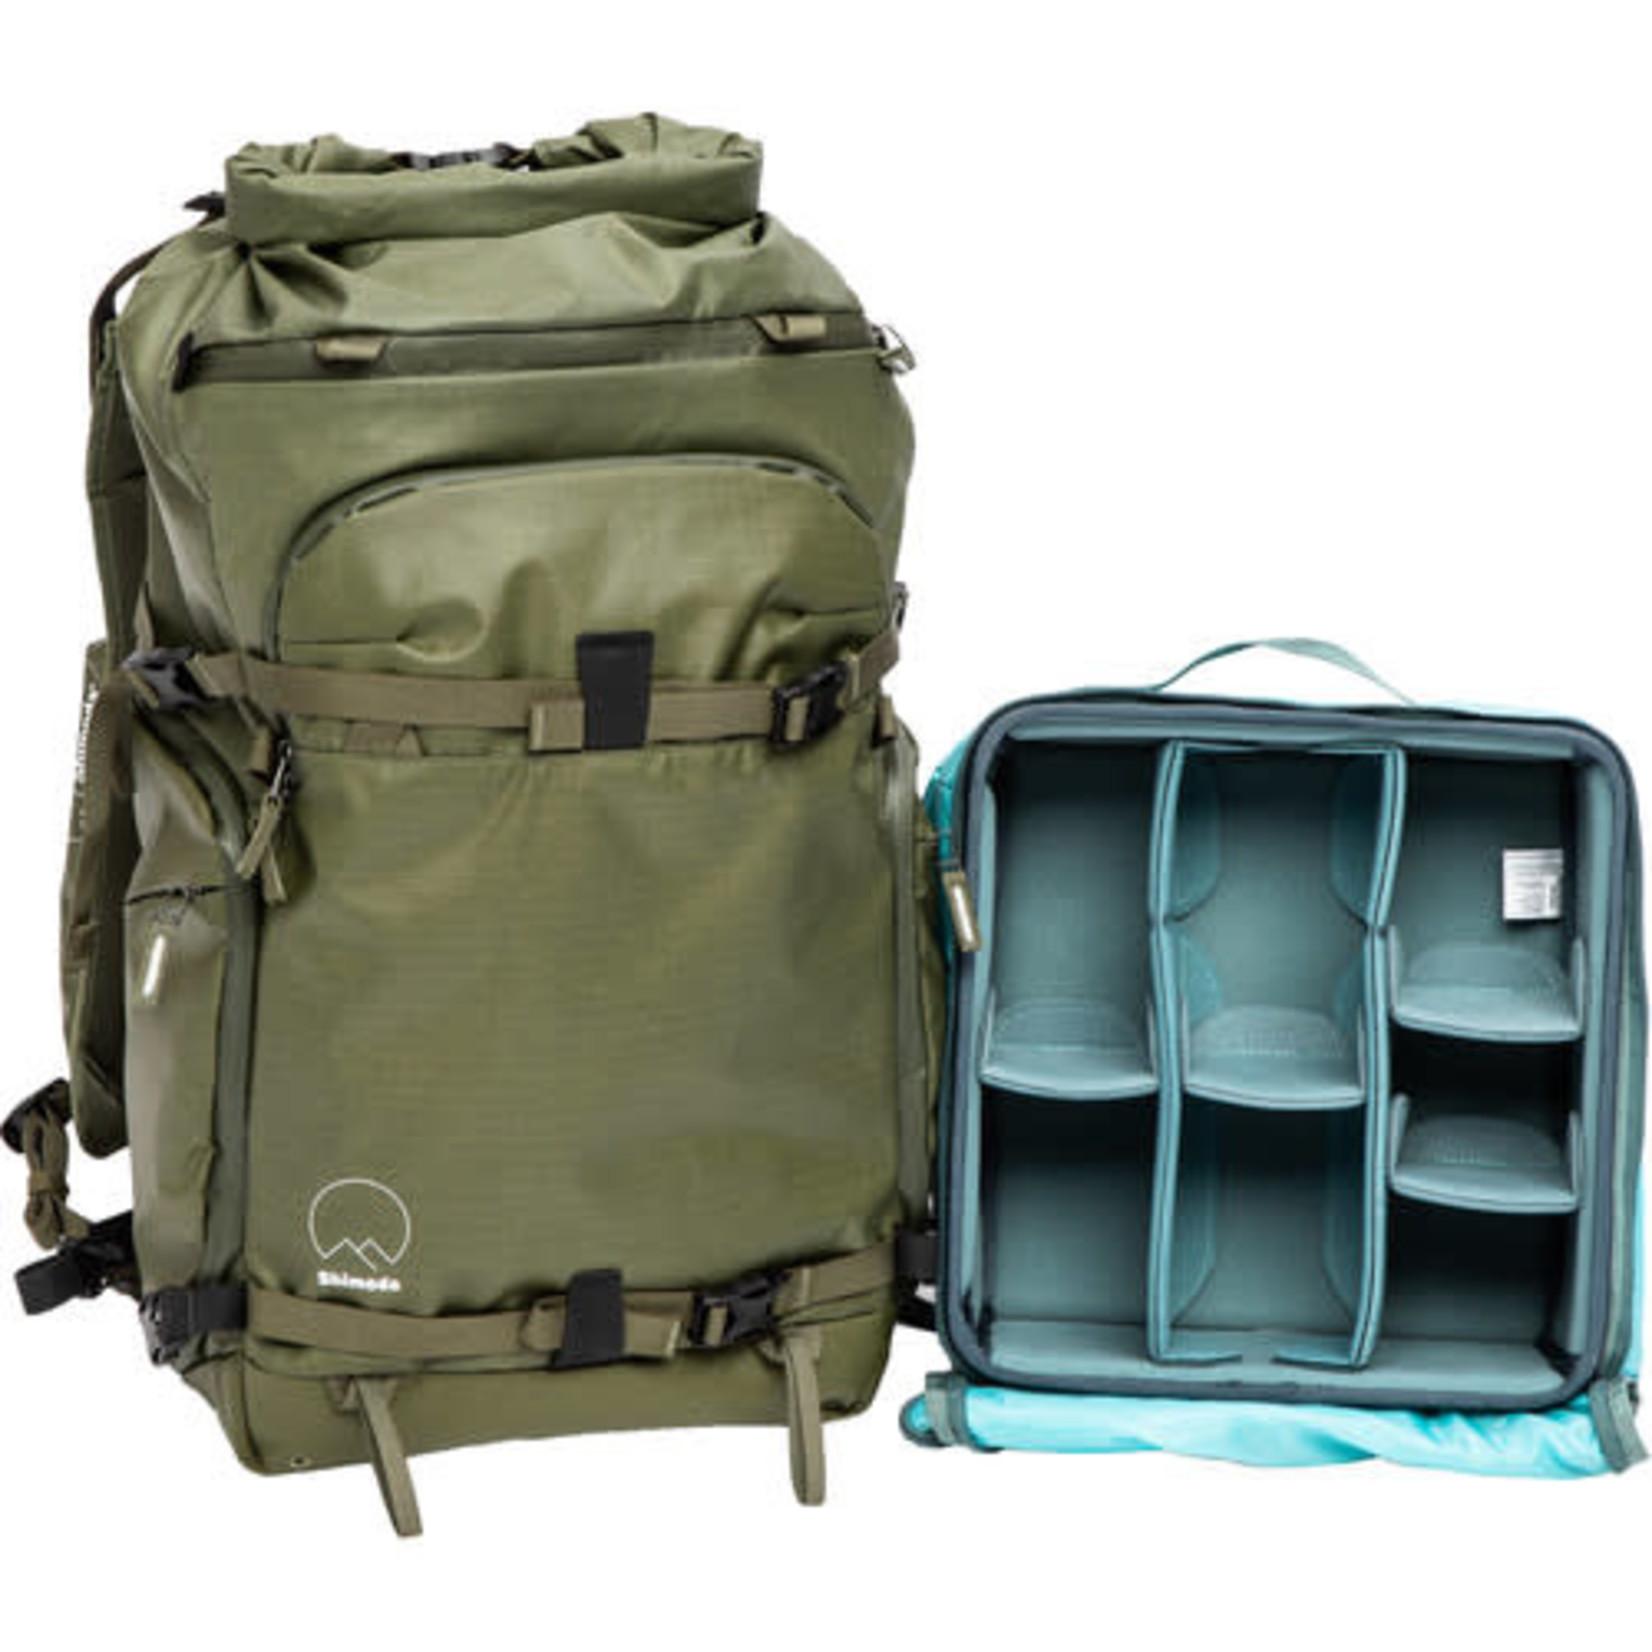 Shimoda Shimoda Designs Action X30 Backpack Starter Kit with Medium Mirrorless Core Unit Version 2 (Army Green)